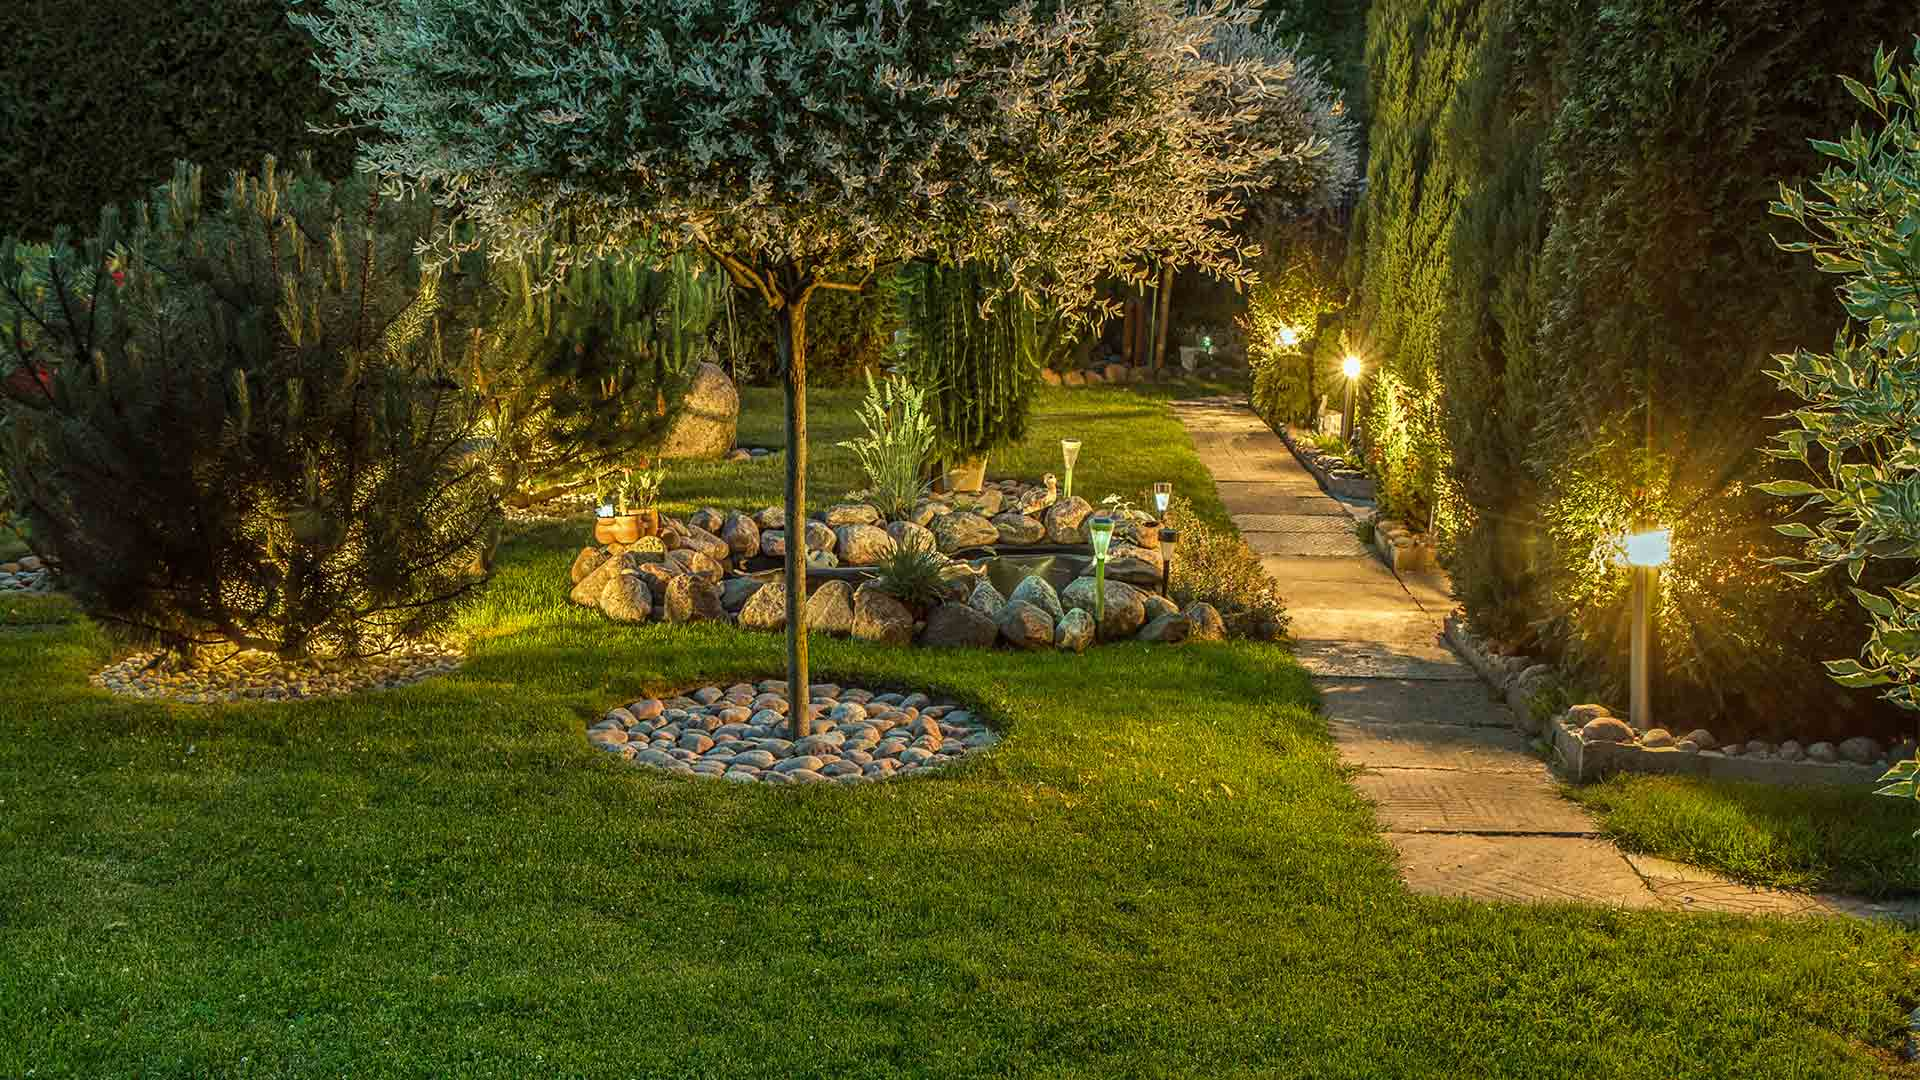 Gartenwegbeleuchtung